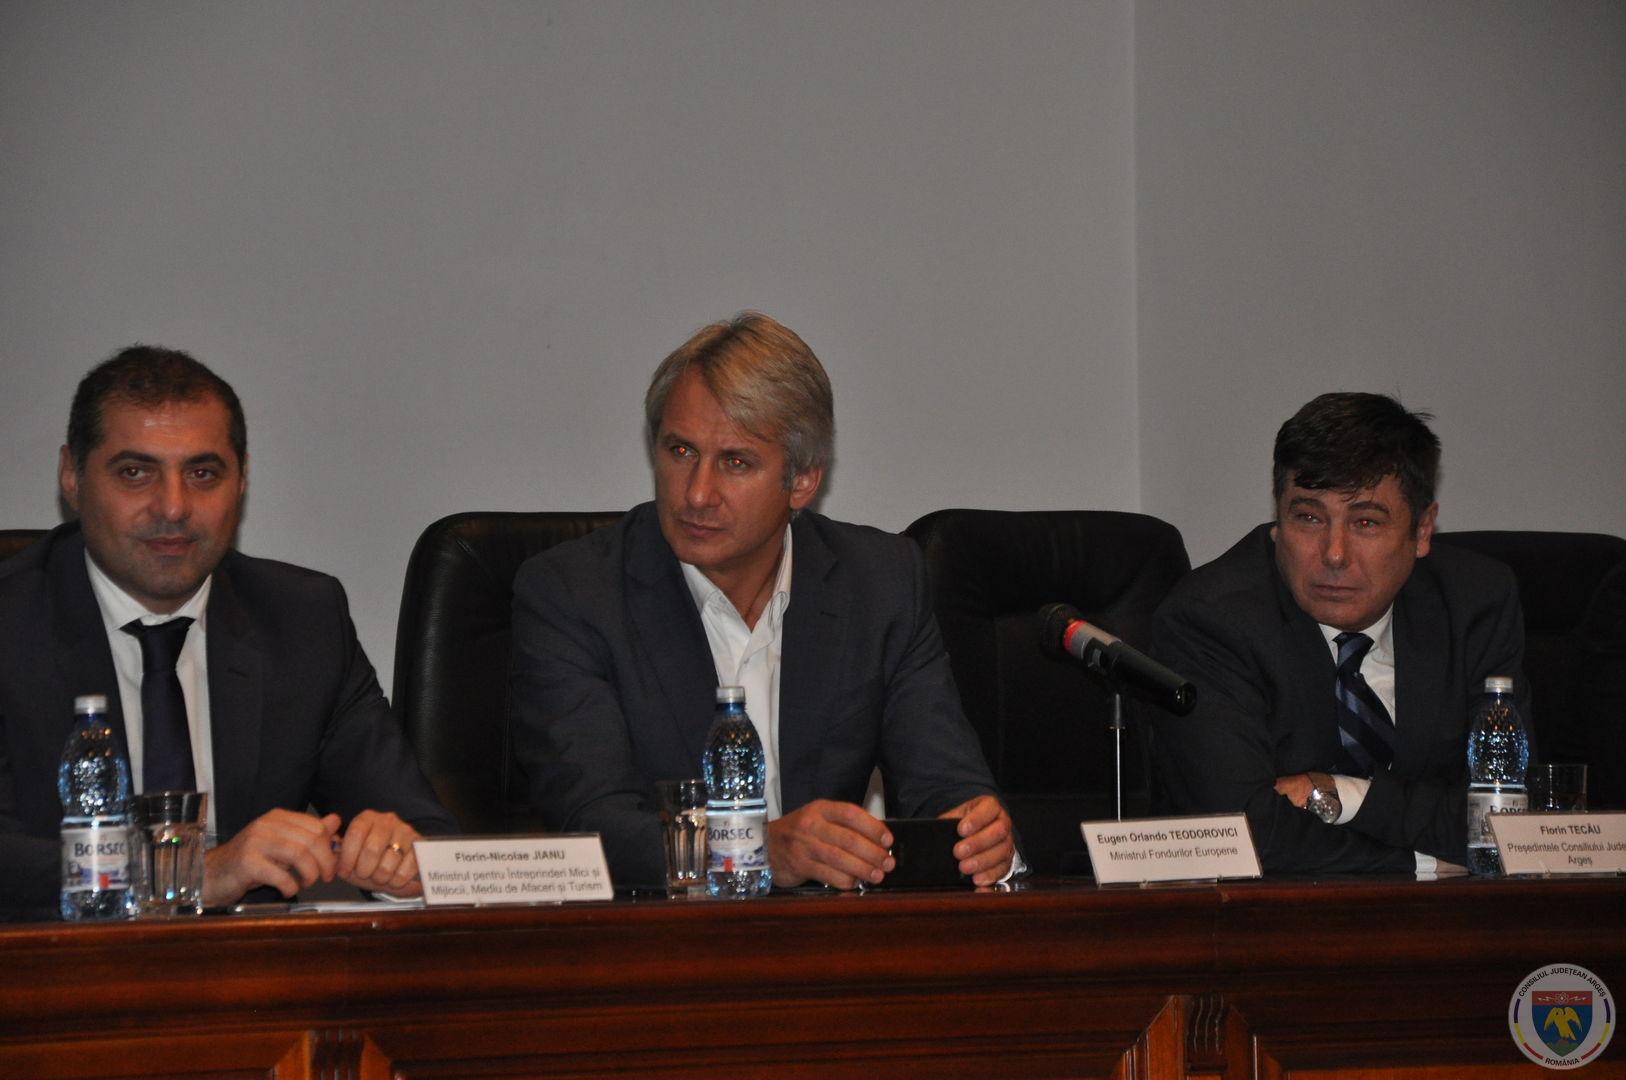 Conferinta Ministrii Teodorovici & Jianu 11.11.2014 (19).JPG